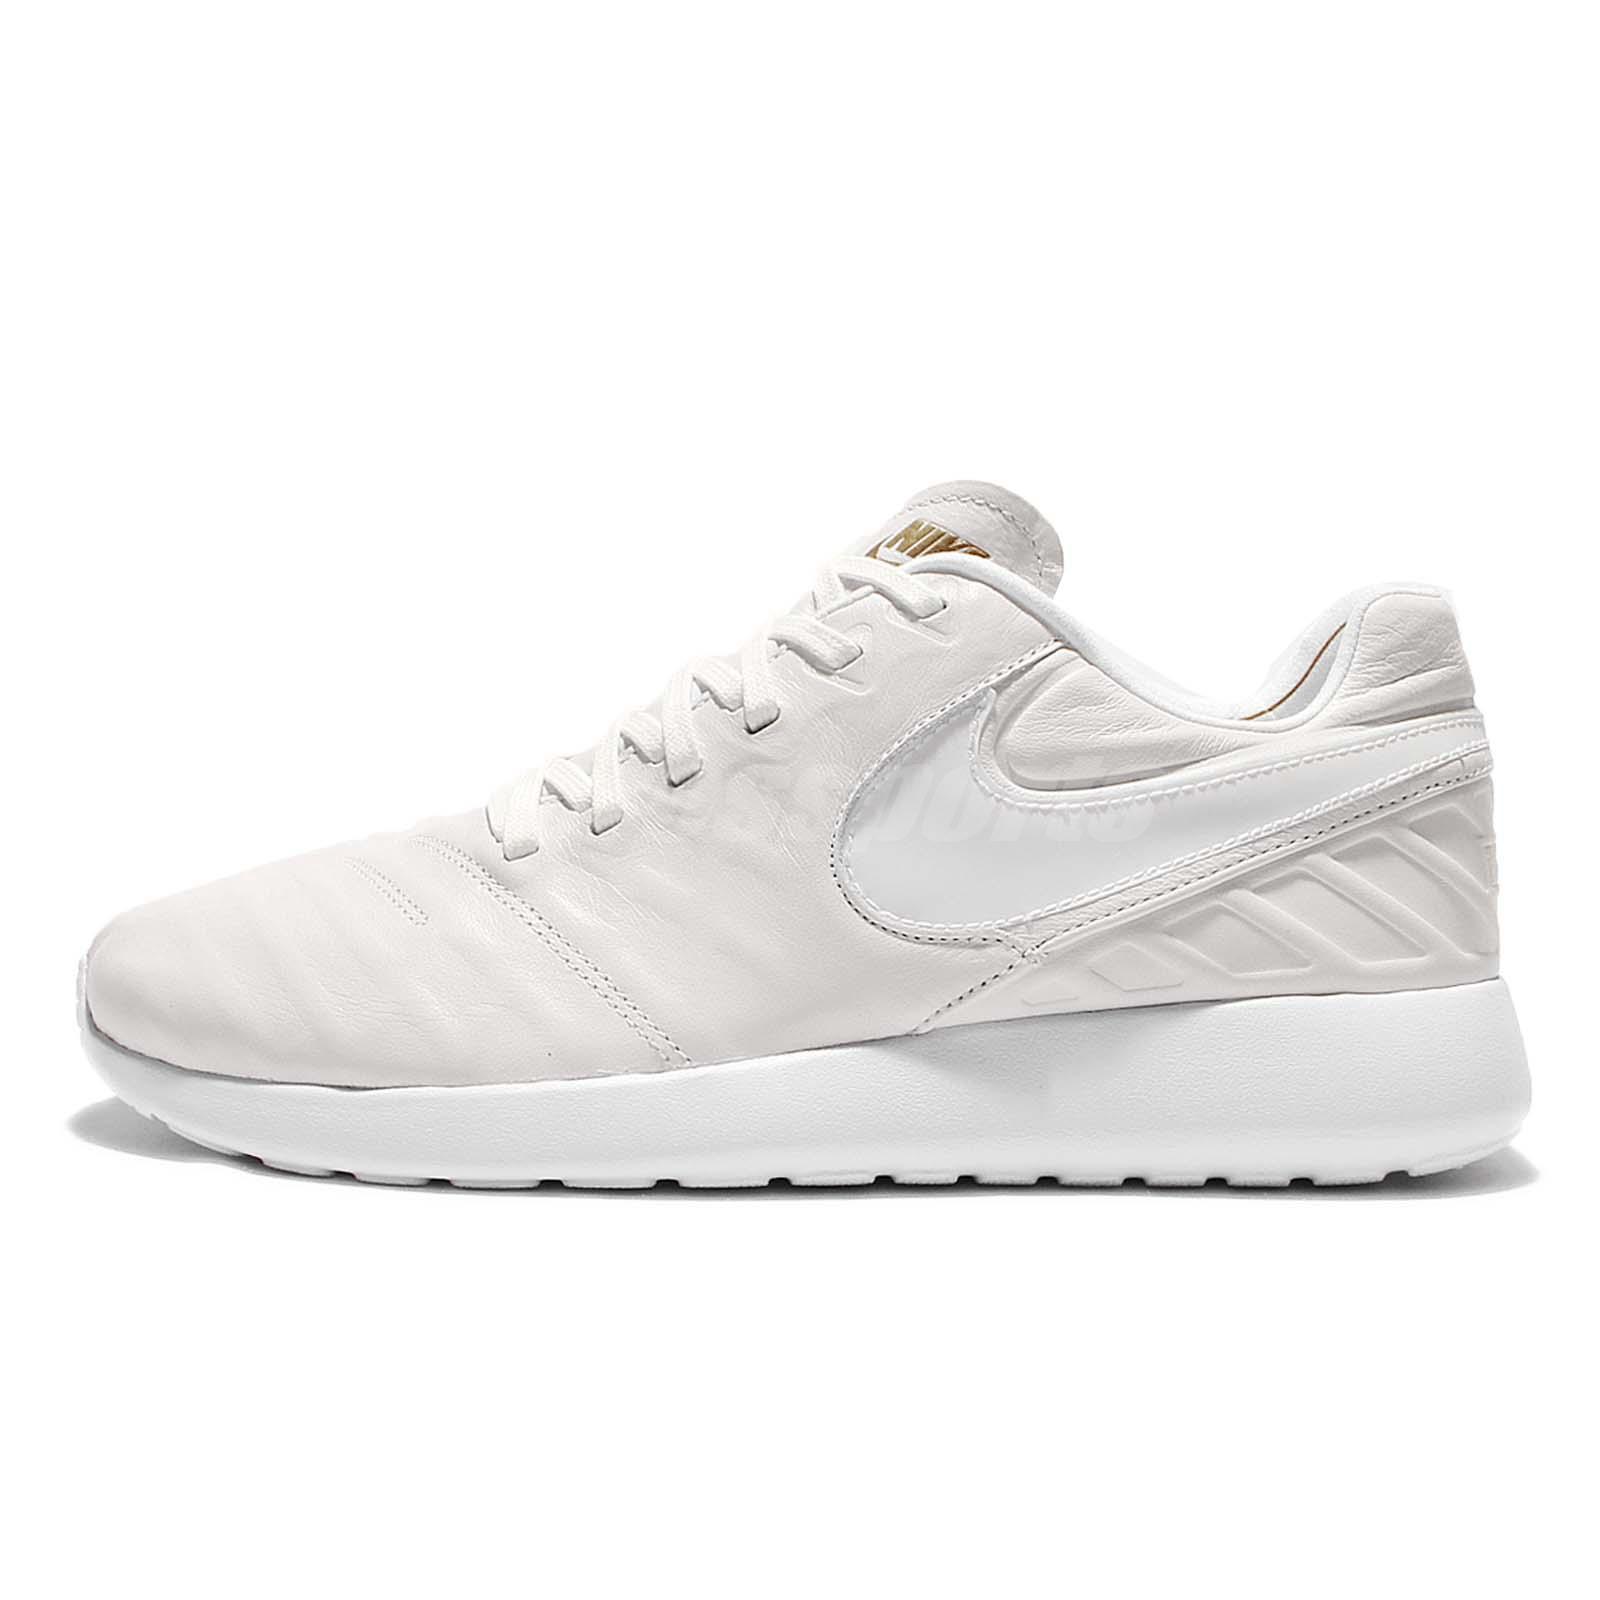 tmpmc SOPHNET x Nike Roshe Tiempo VI QS One Run White Leather Mens